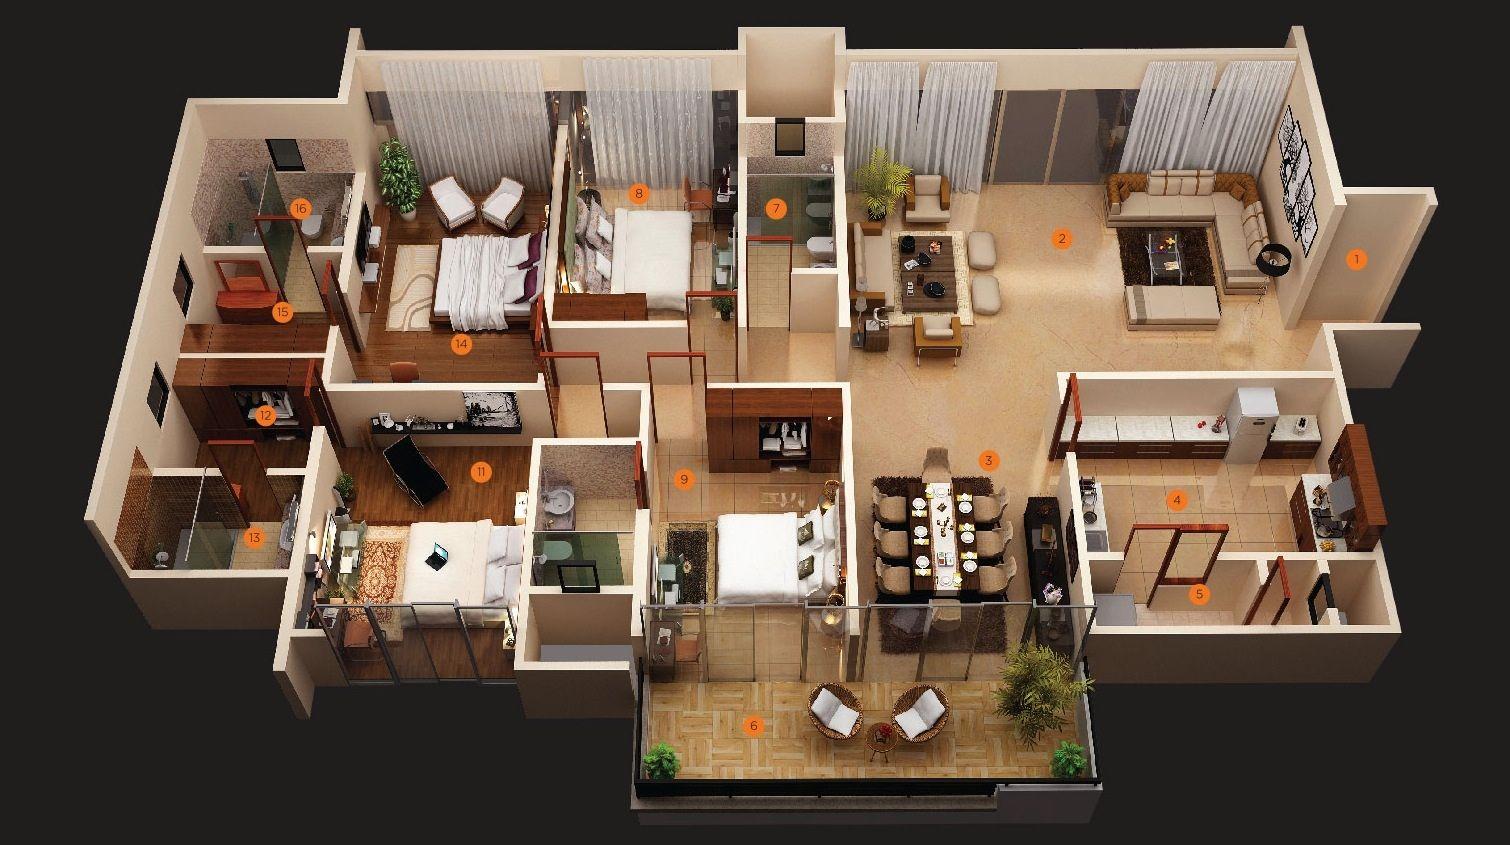 Four Bedroom House Plans Modern 4 Bedroom House Plans Decor Units In 2020 Four Bedroom House Plans 4 Bedroom House Designs 3d House Plans